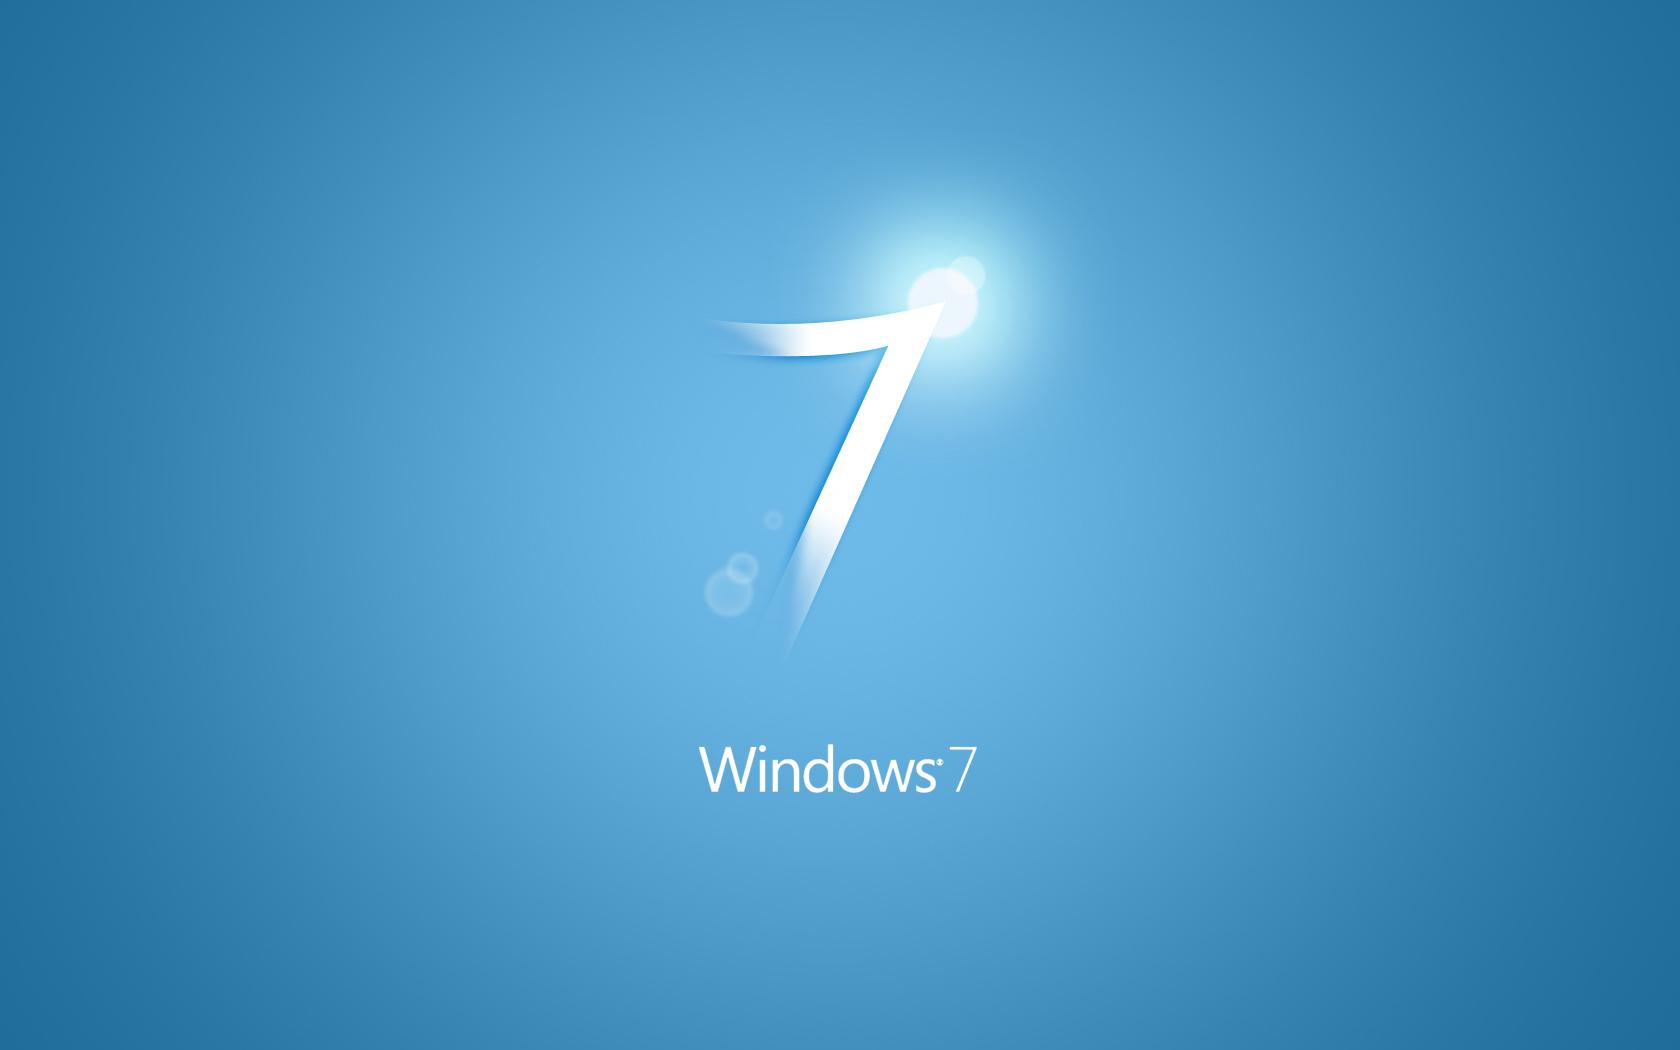 Free Download Hd Screensaver Windows 7